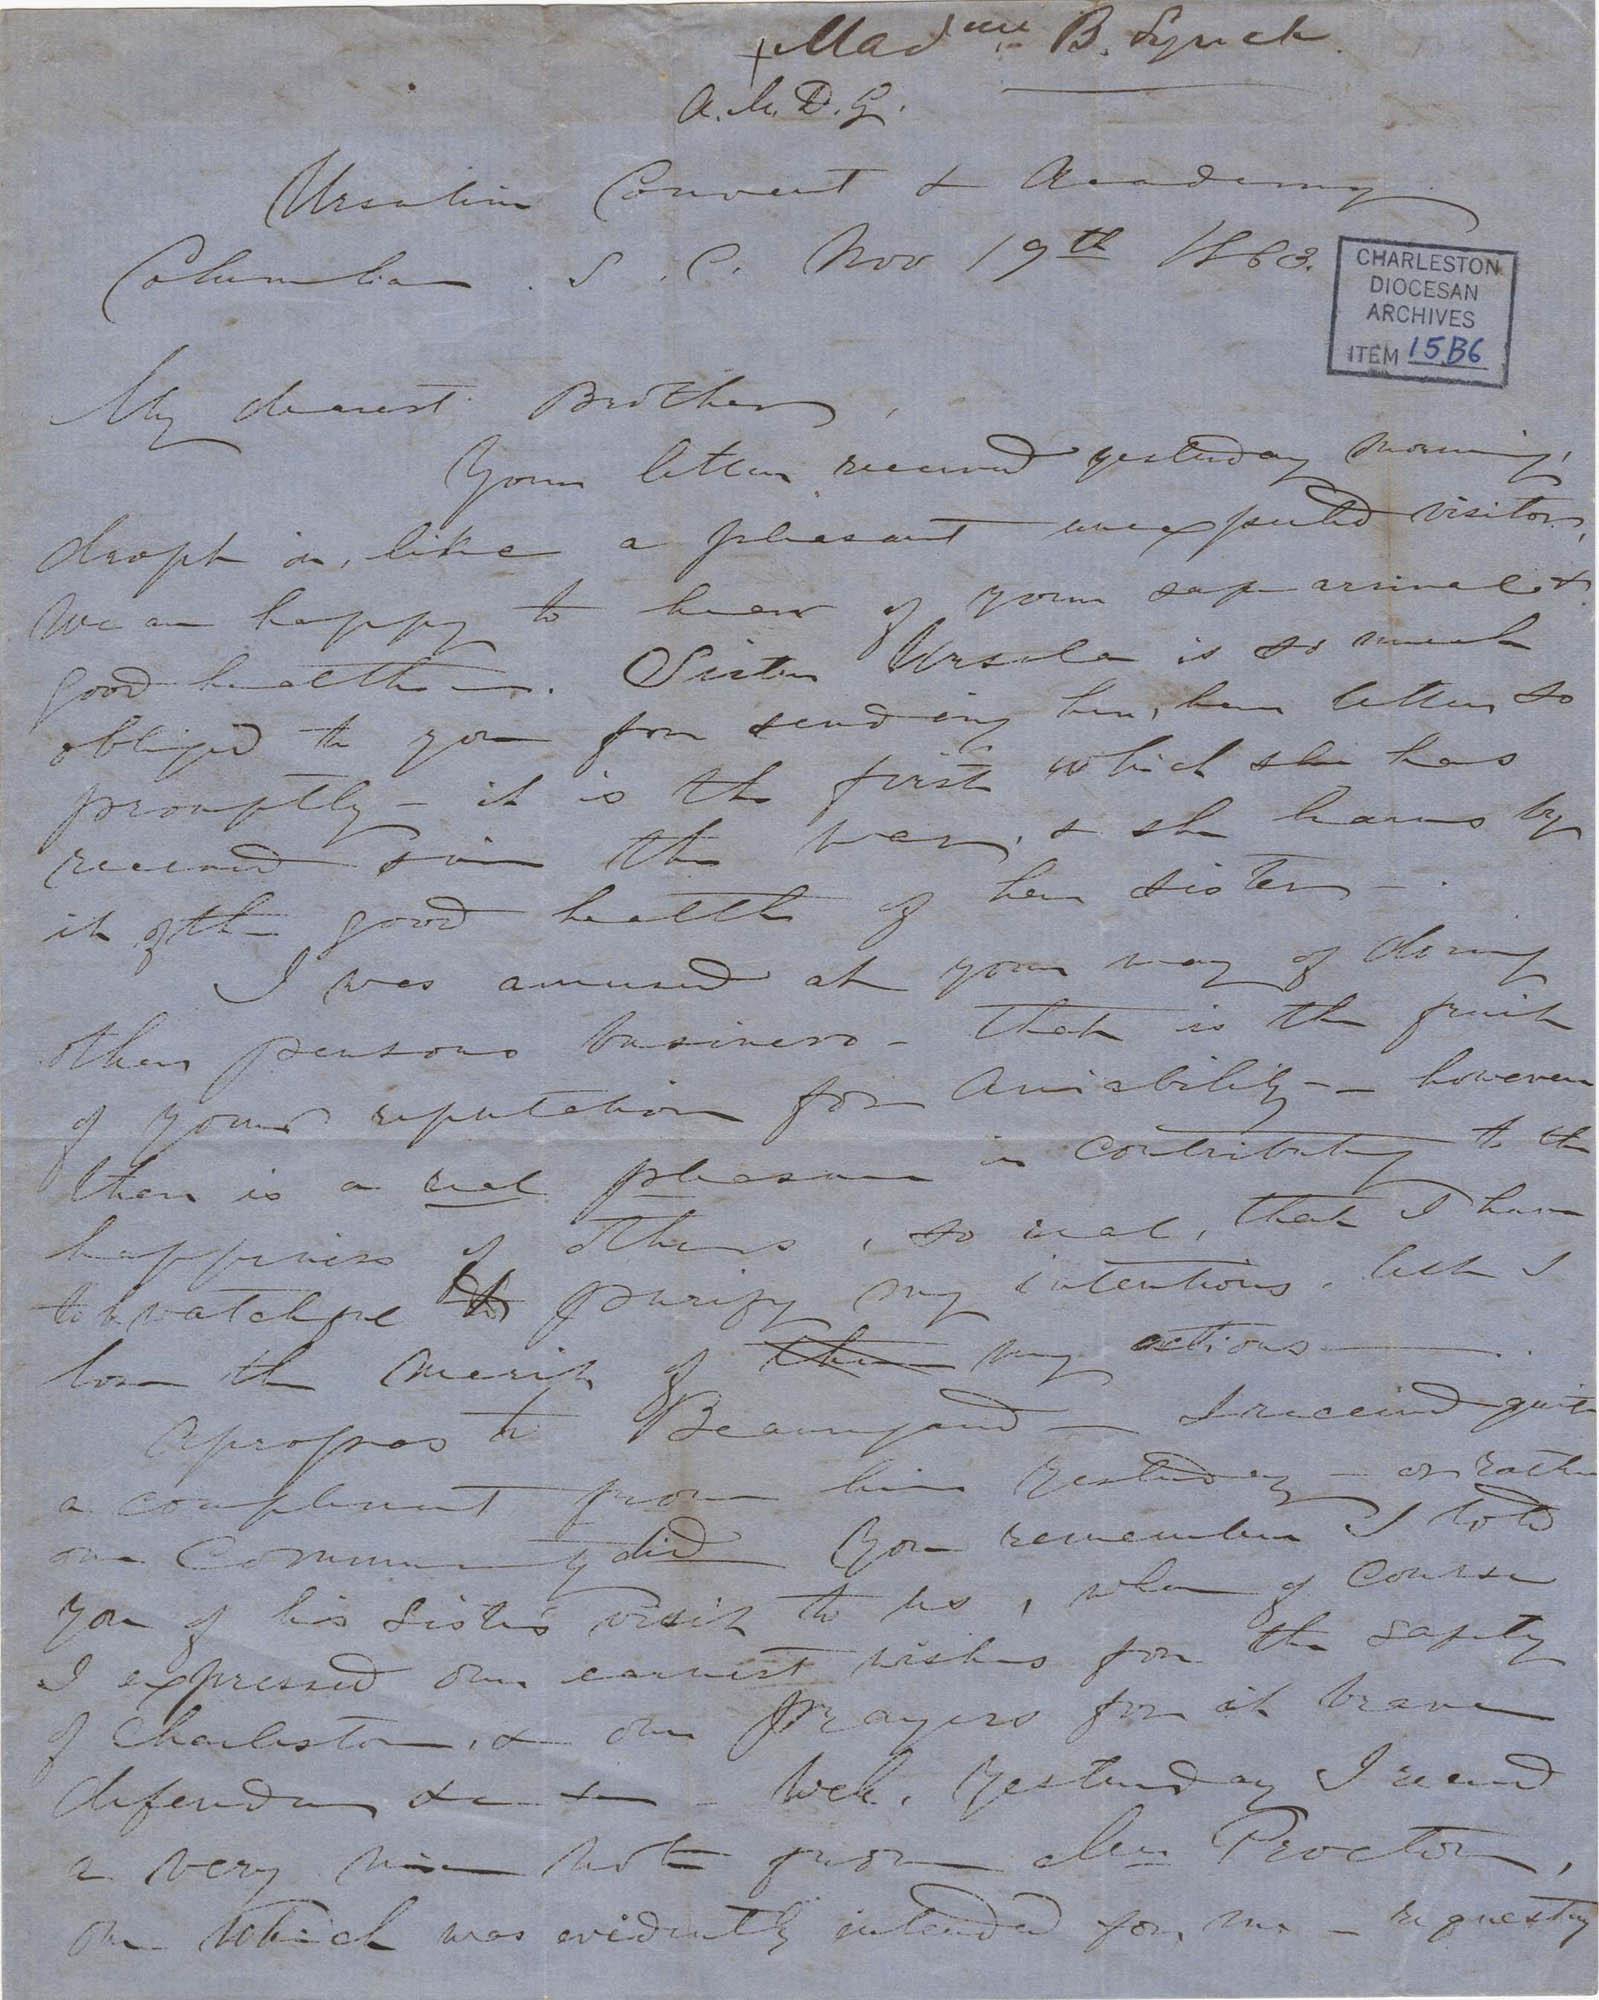 323. Madame Baptiste to Bp Patrick Lynch -- November 19, 1863